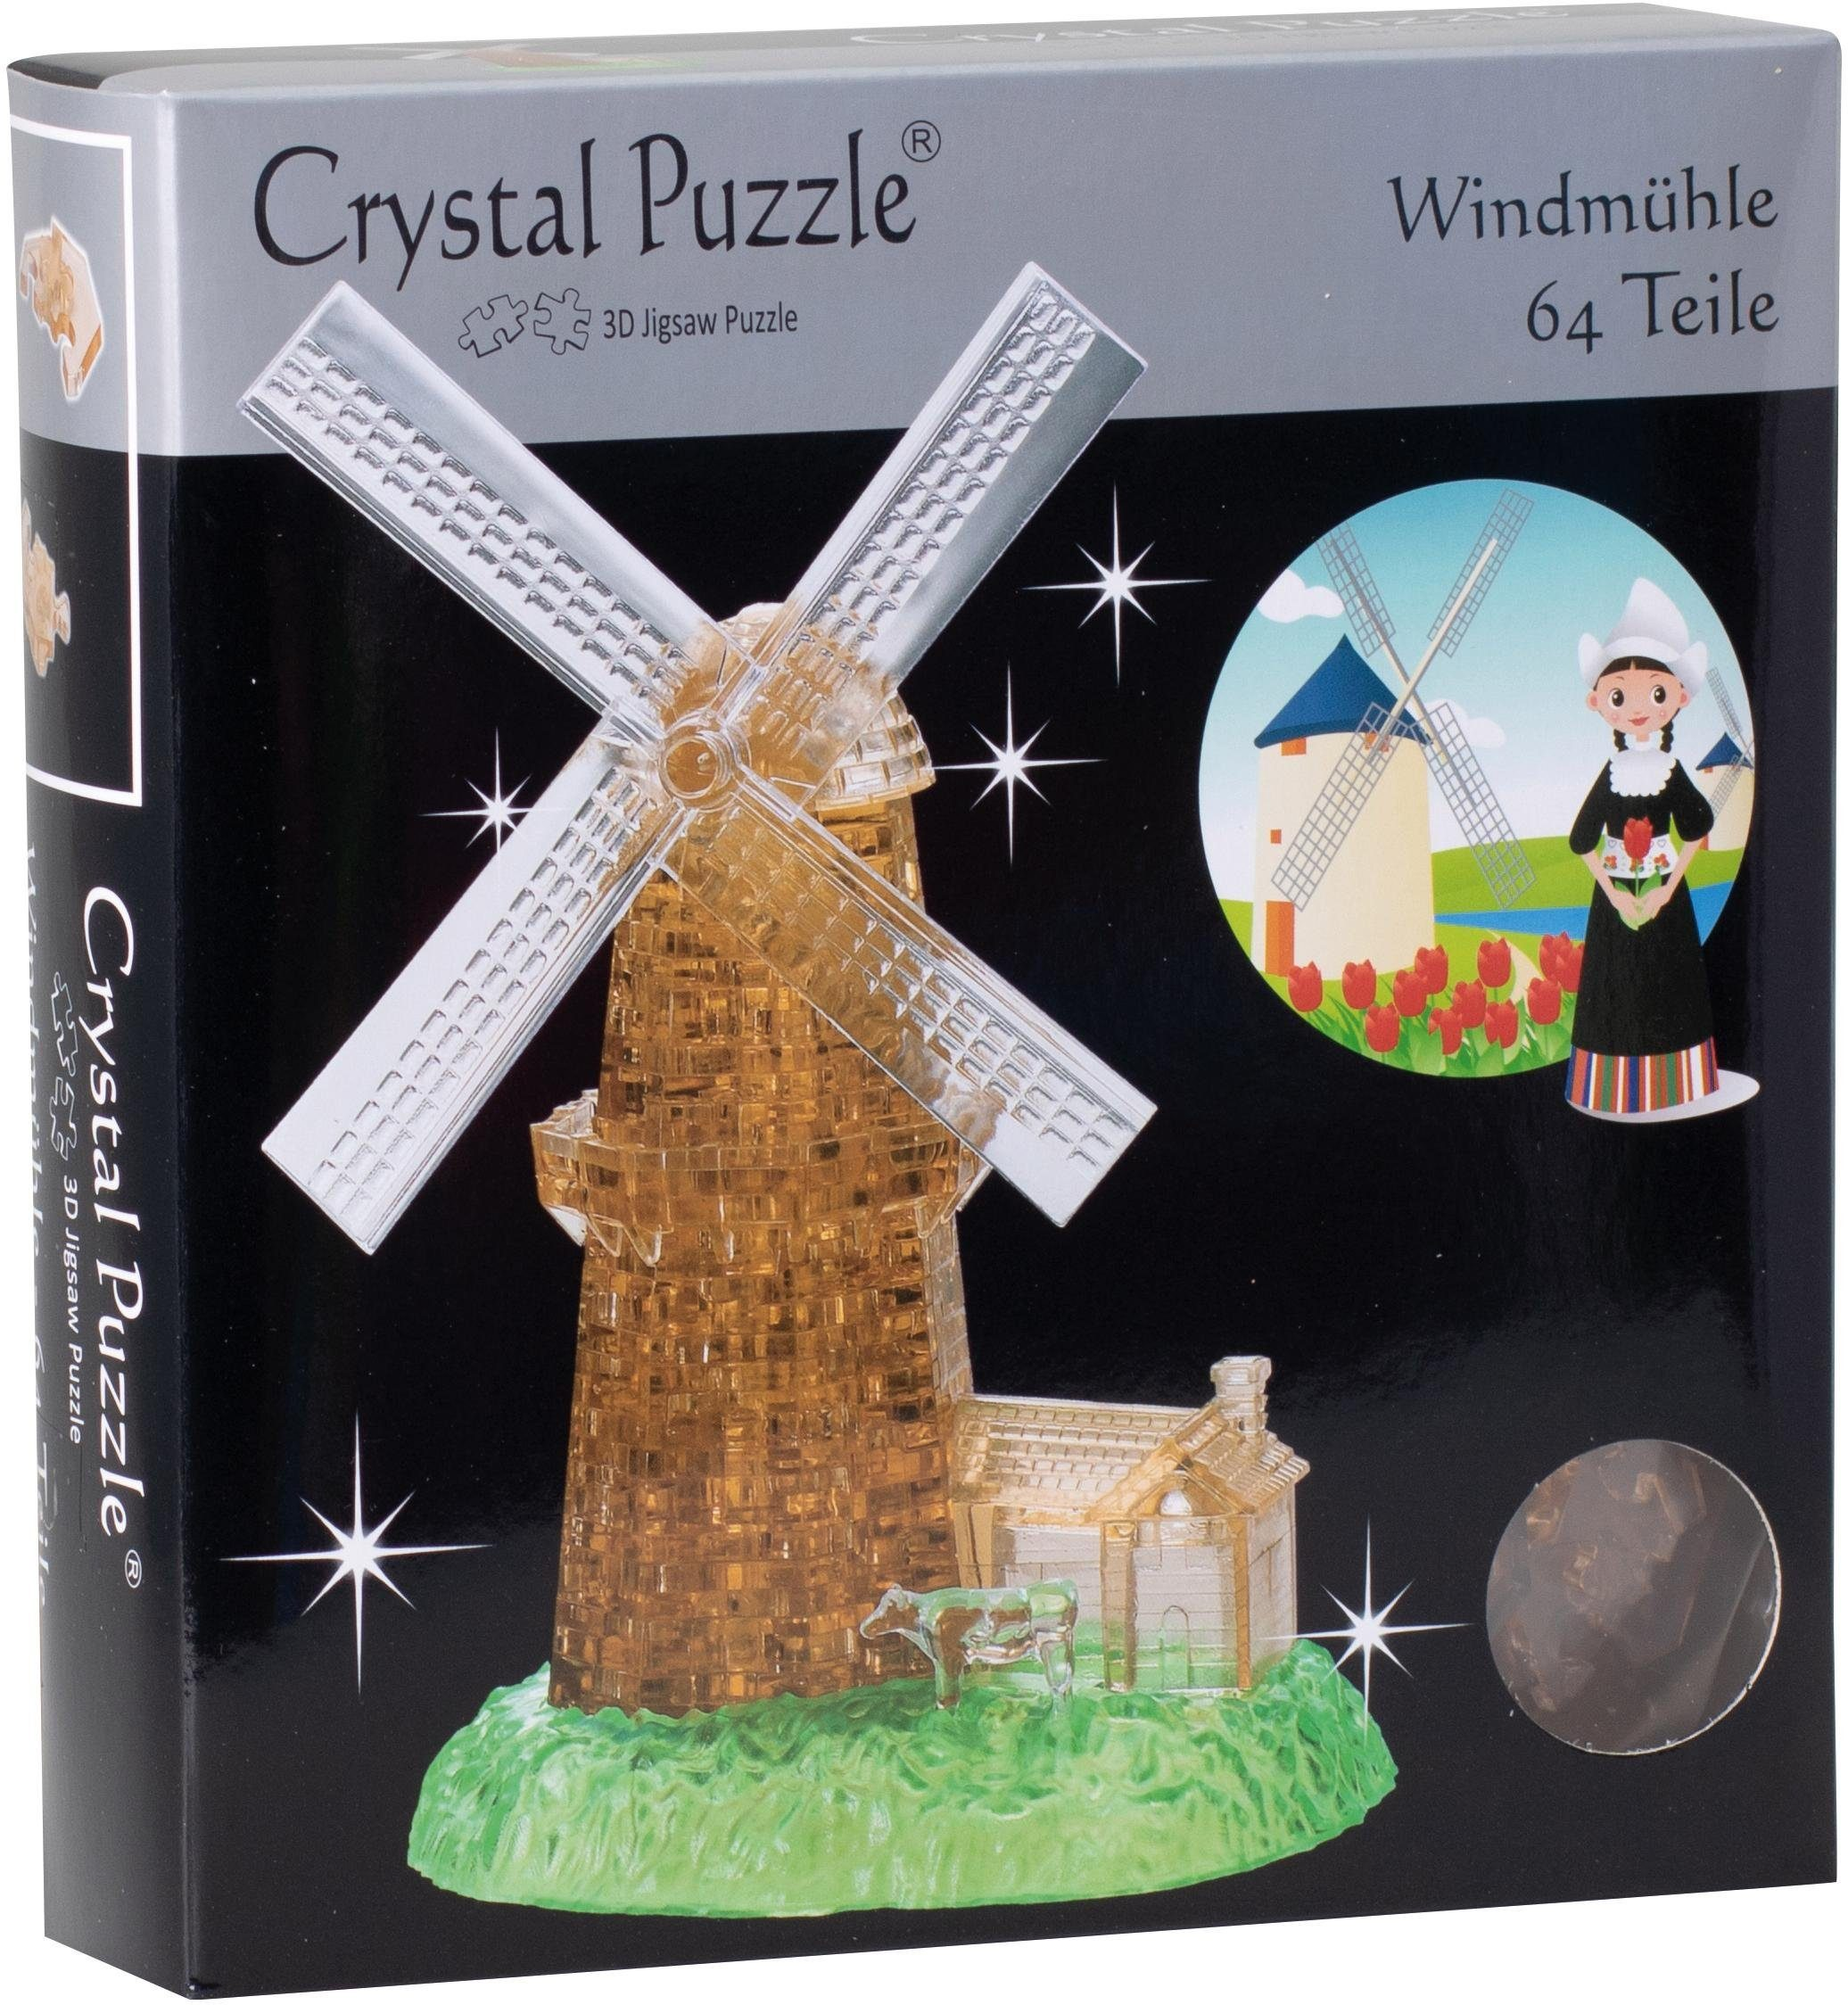 Crystal Puzzle® 3D-Puzzle, 64 Teile, »Windmühle«